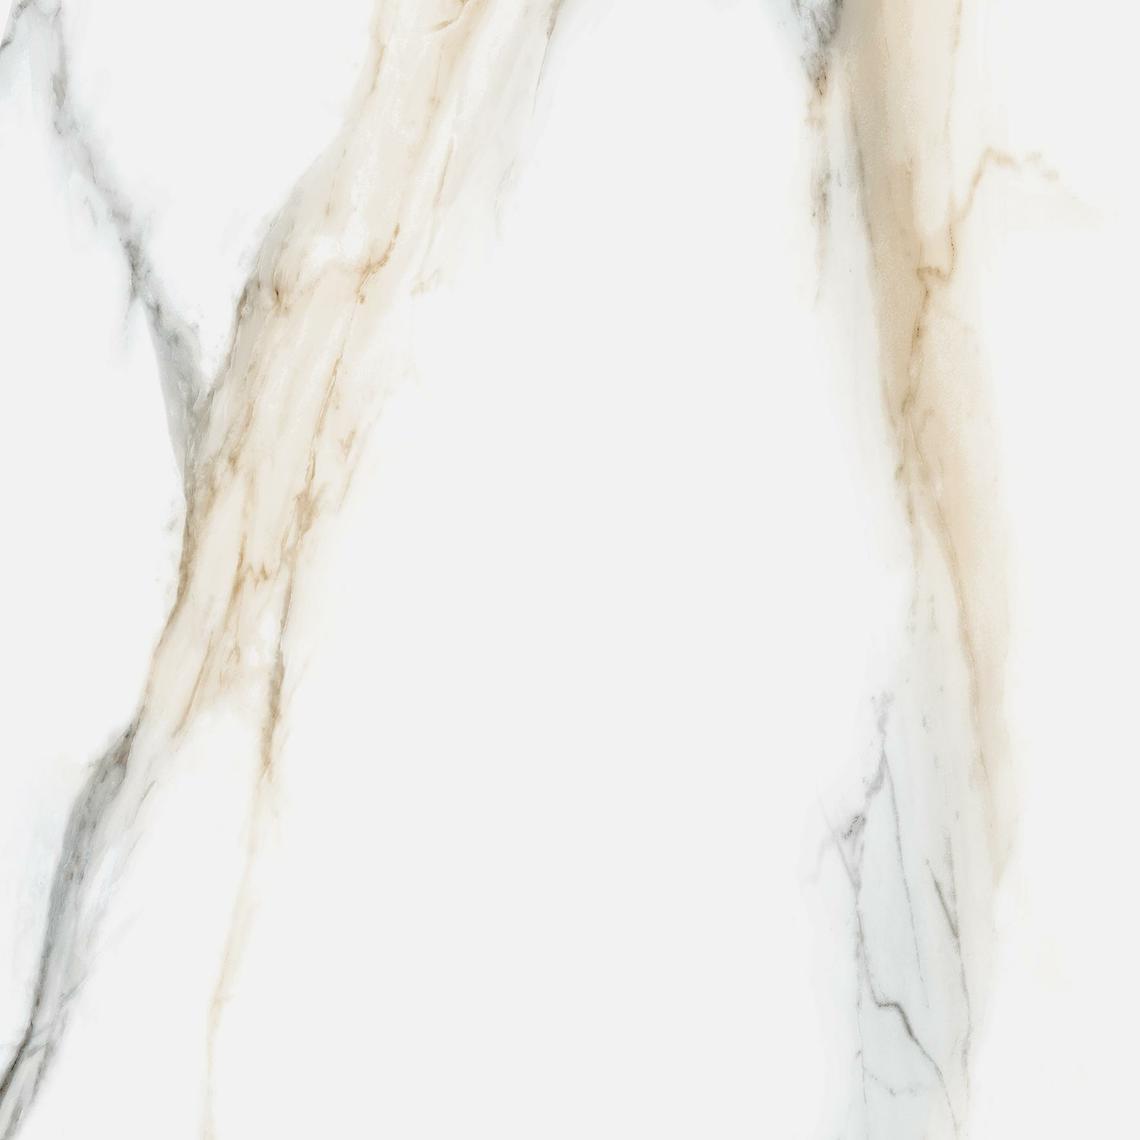 ATLANTIS GOLD SHINY RECT. (75x75)